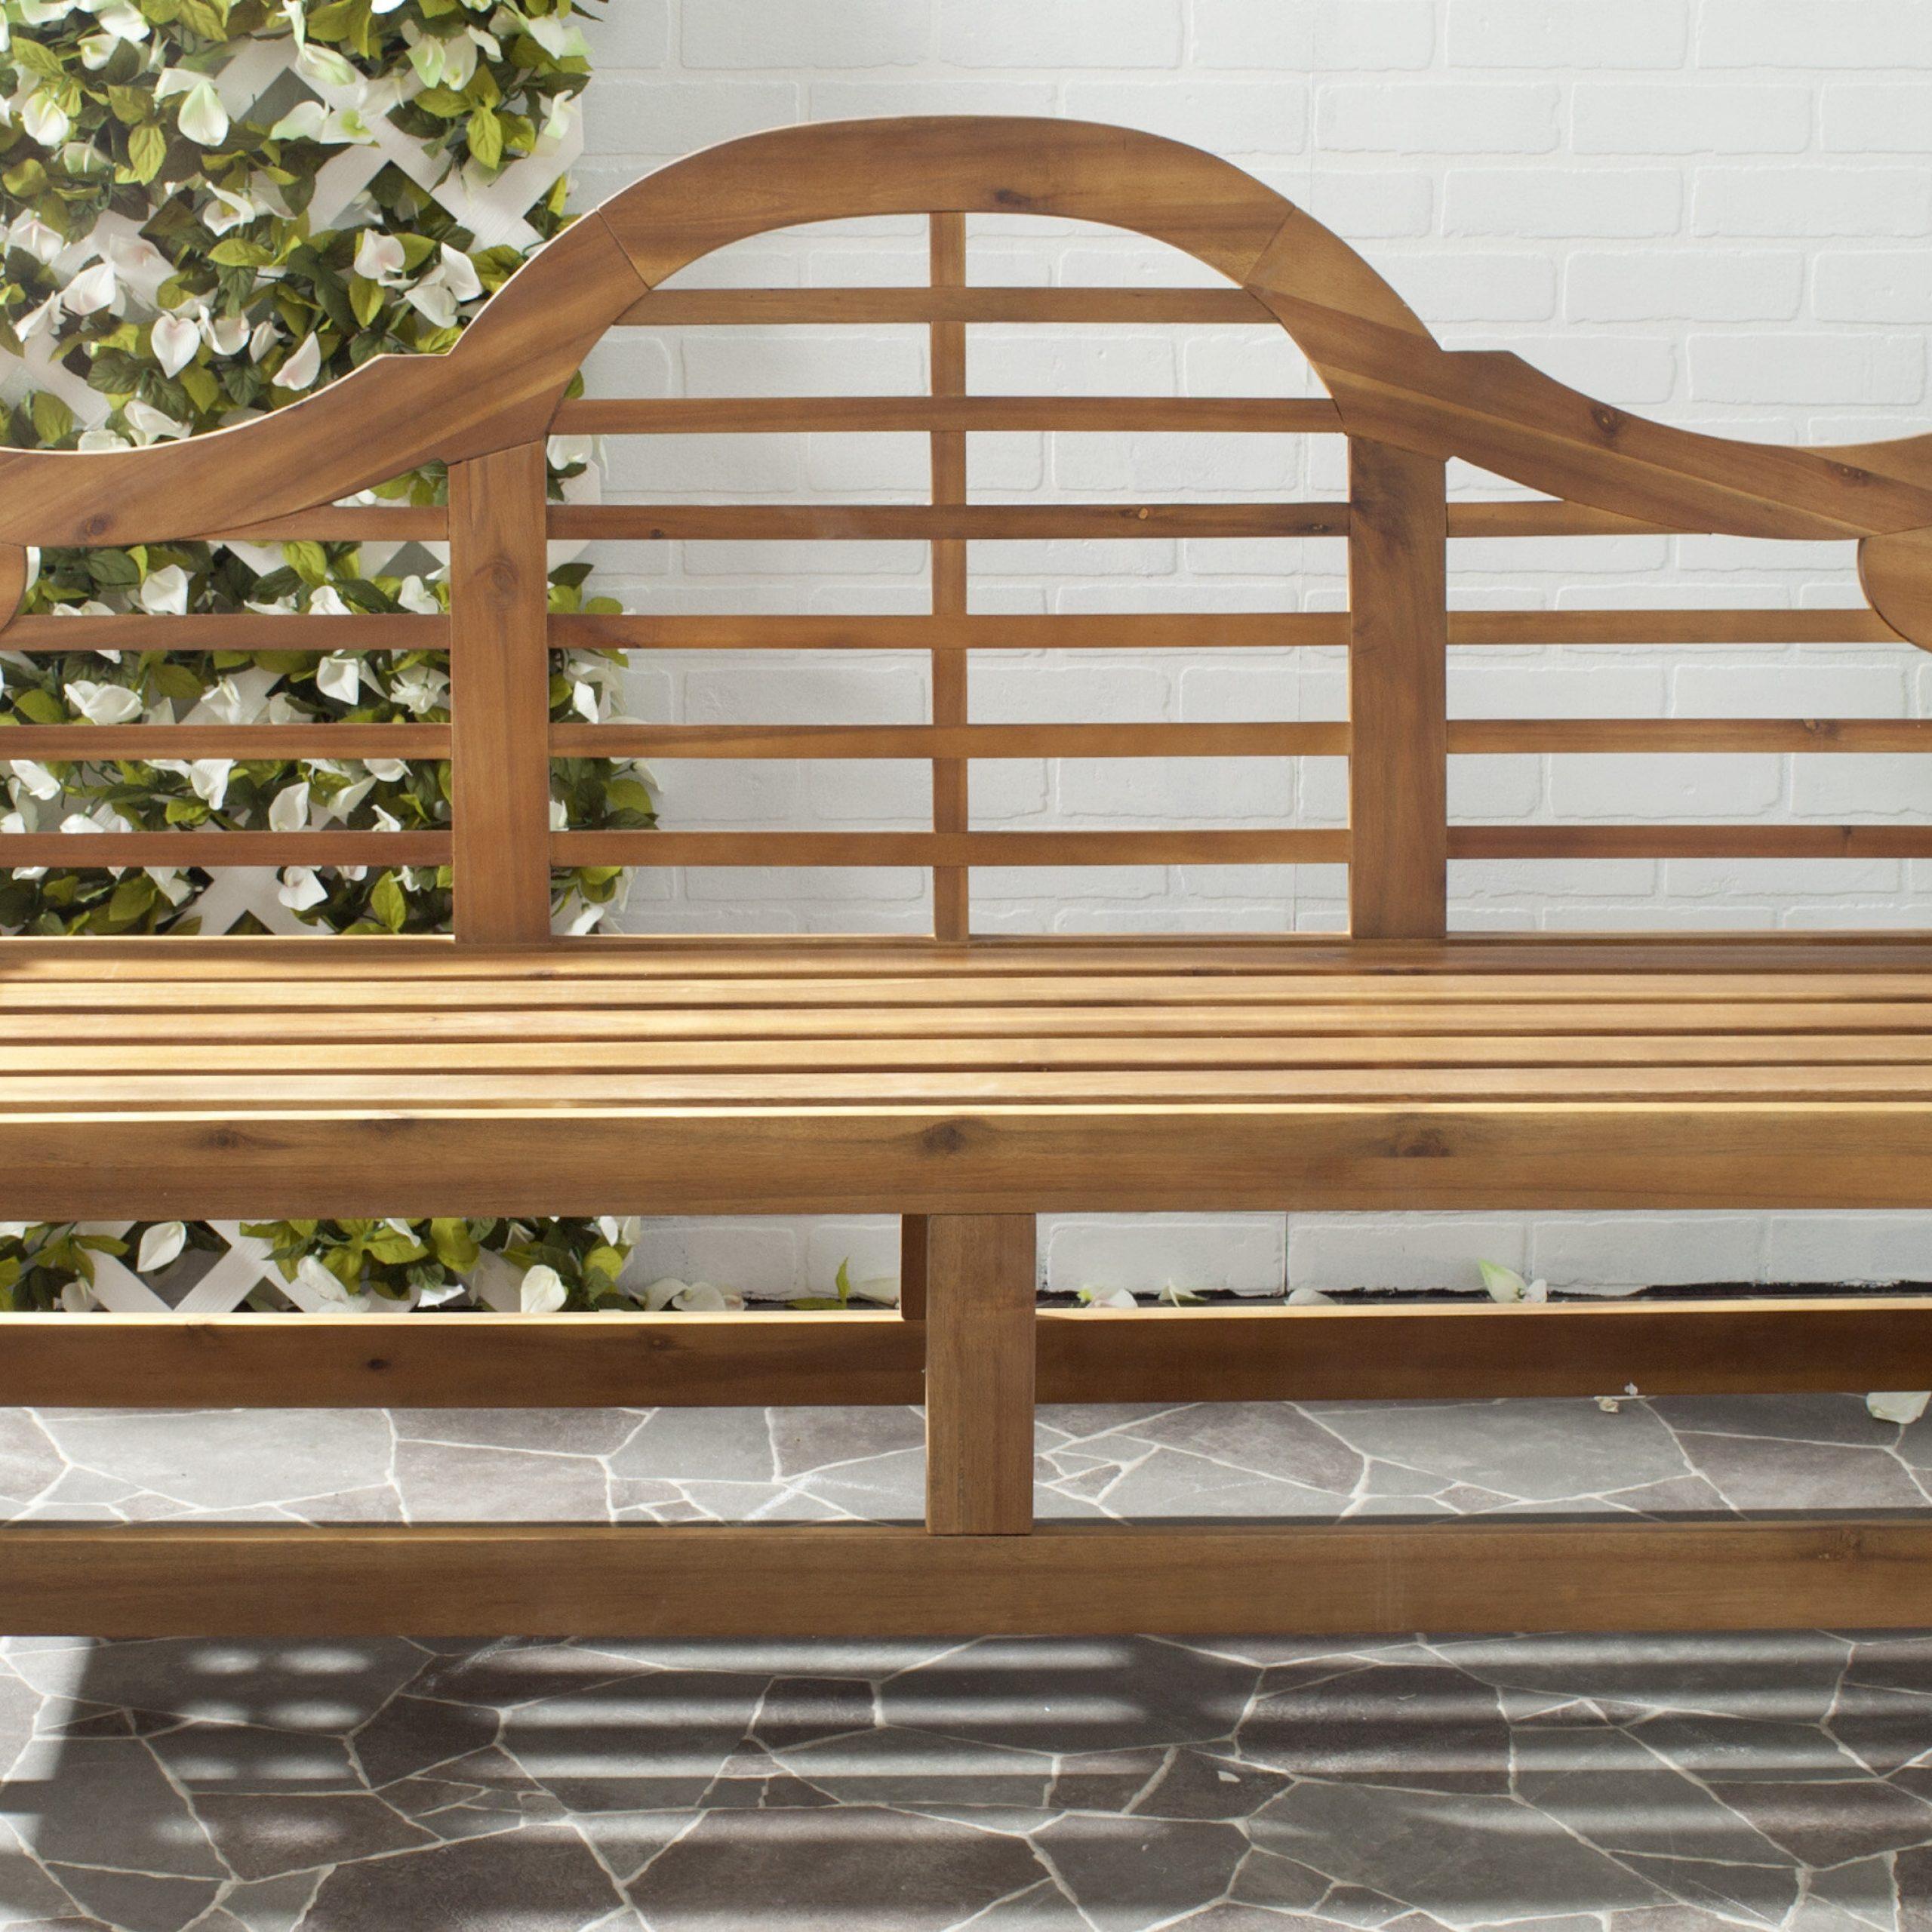 Ziemer Wooden Garden Bench With Leora Wooden Garden Benches (View 25 of 25)